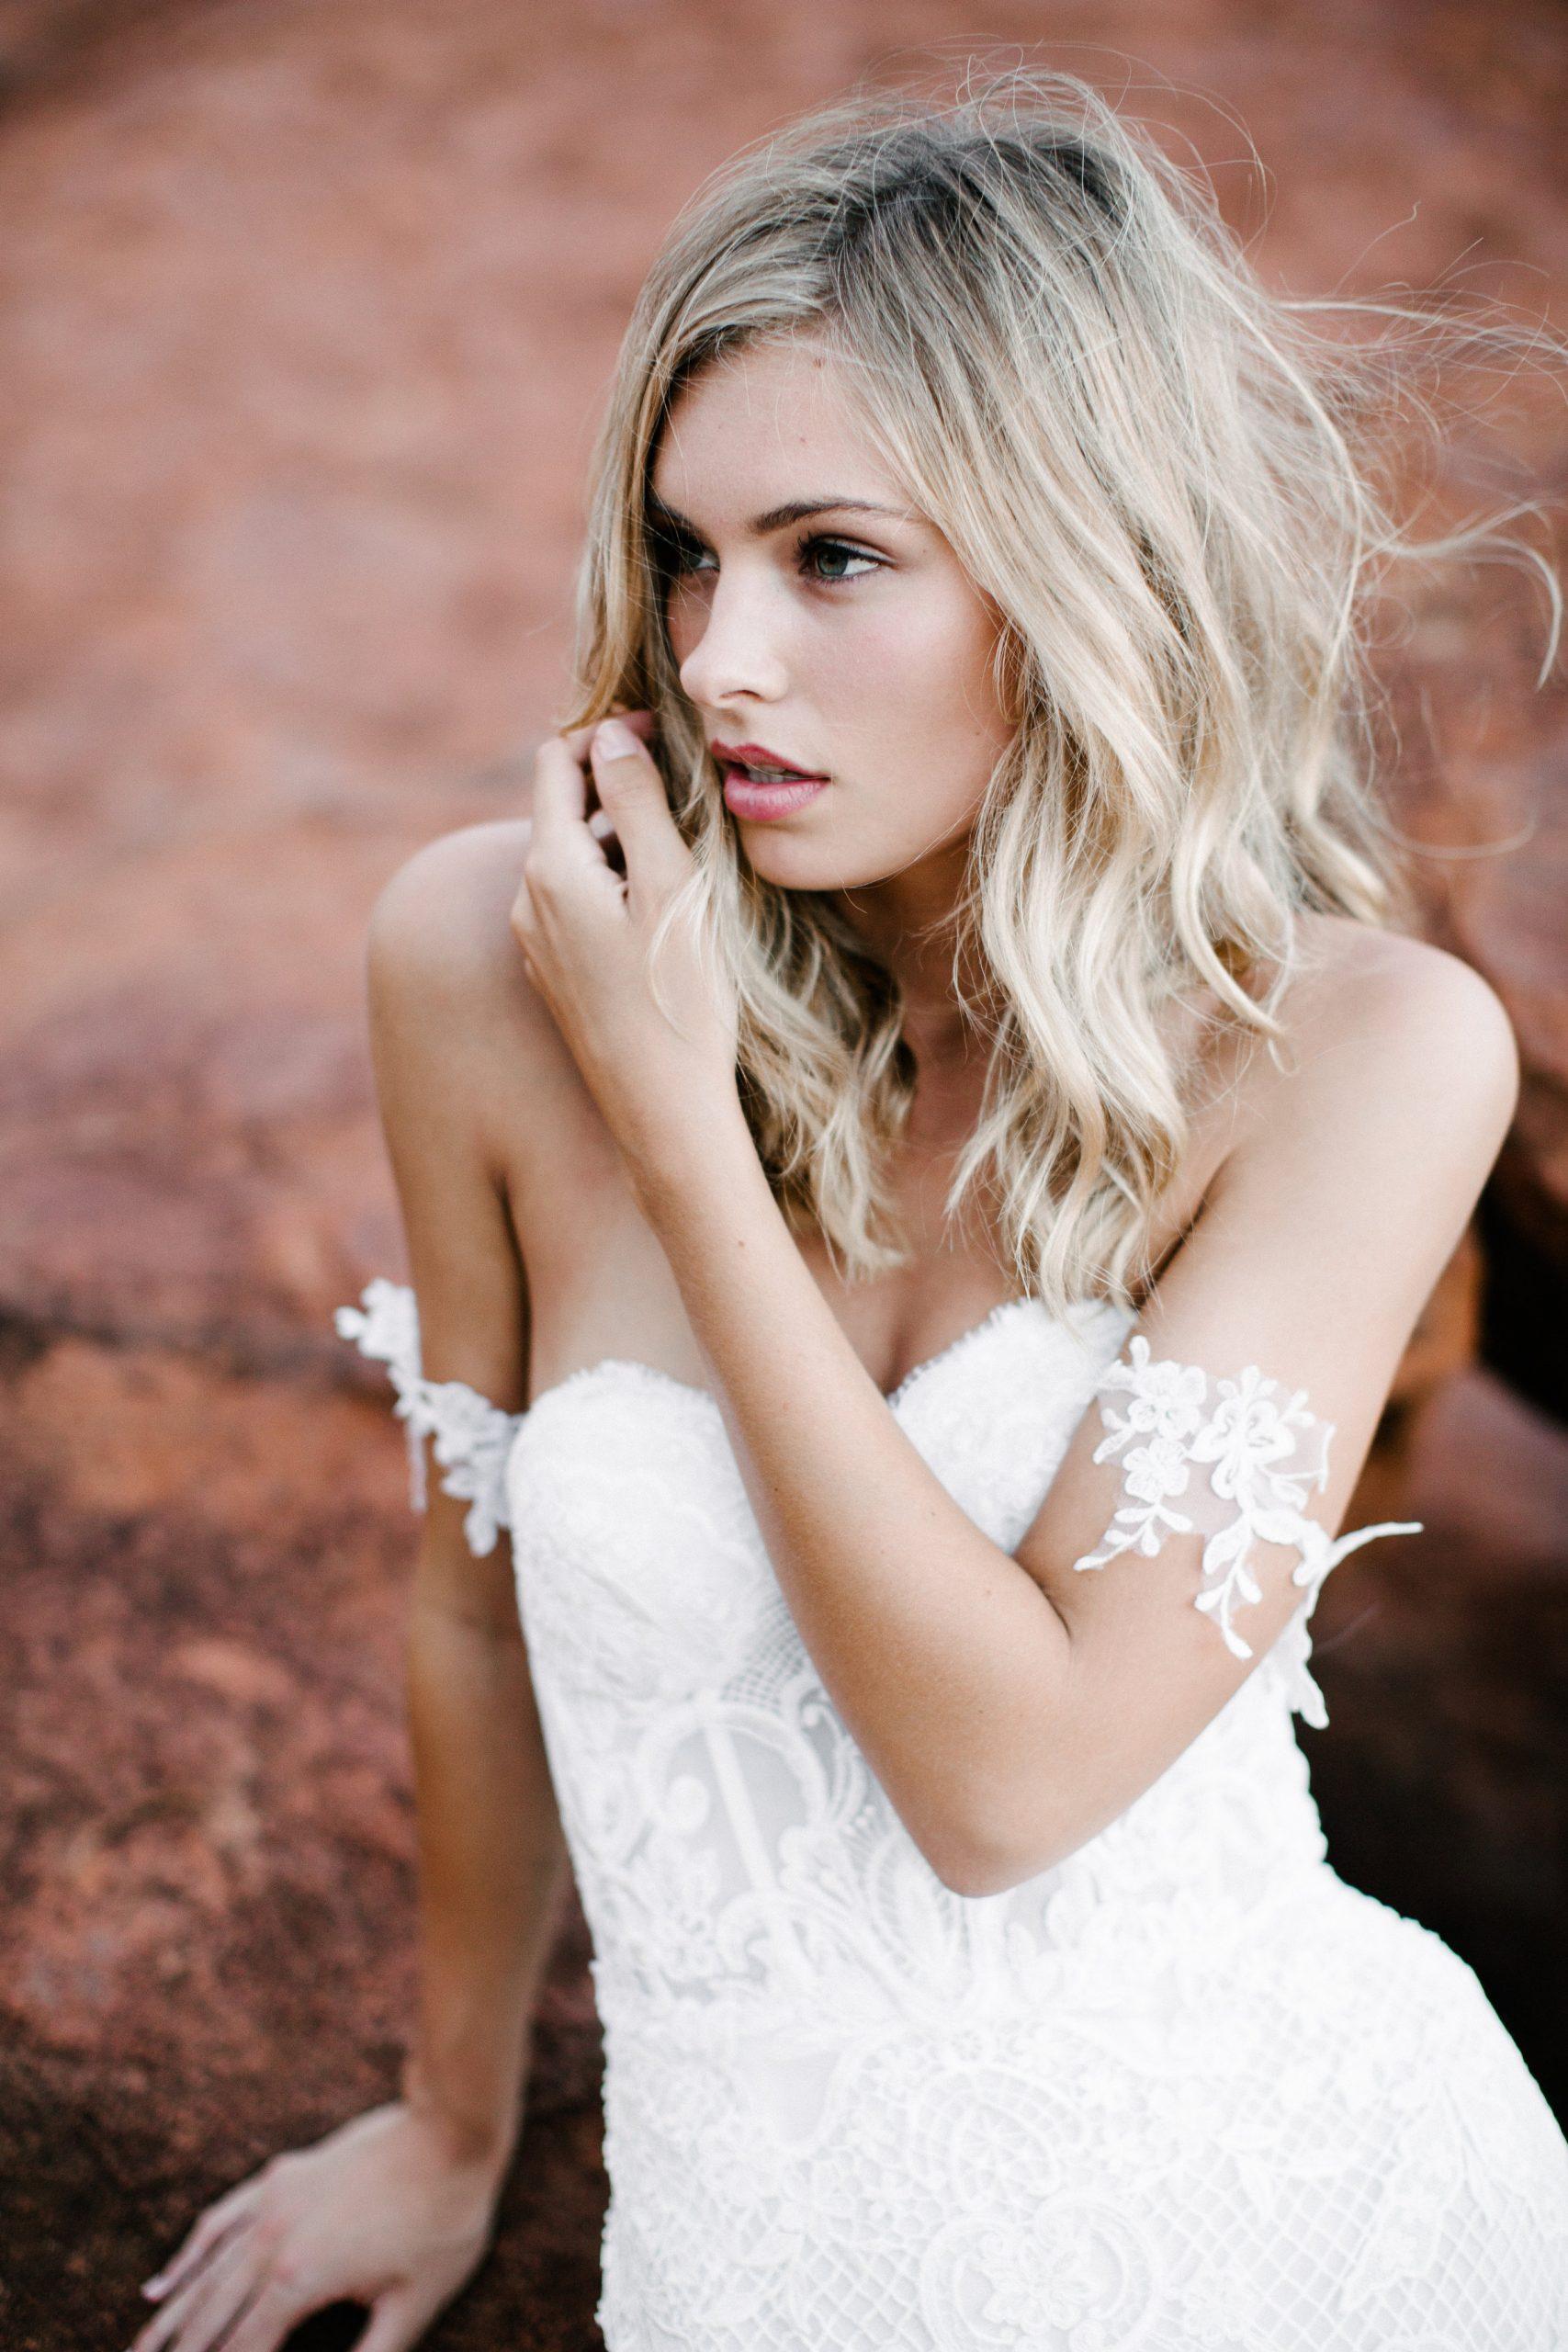 gold coast bridal wear, boho wedding dresses, gold coast wedding dresses, bohemian wedding dress, gold coast tipis, made with love bridal